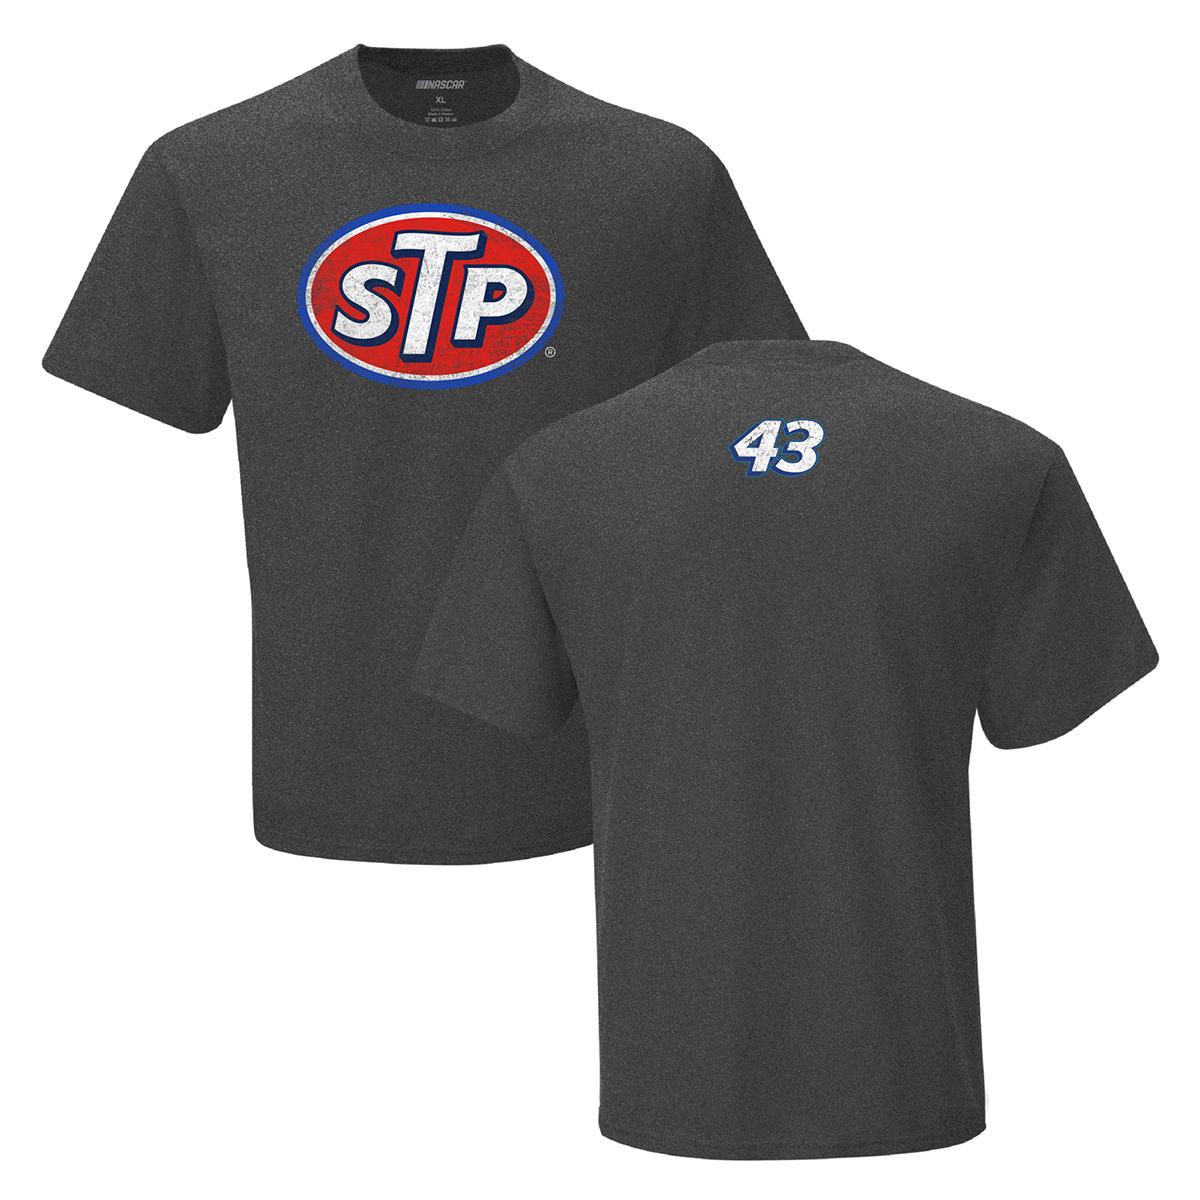 Bubba Wallace NASCAR #43 STP T-shirt